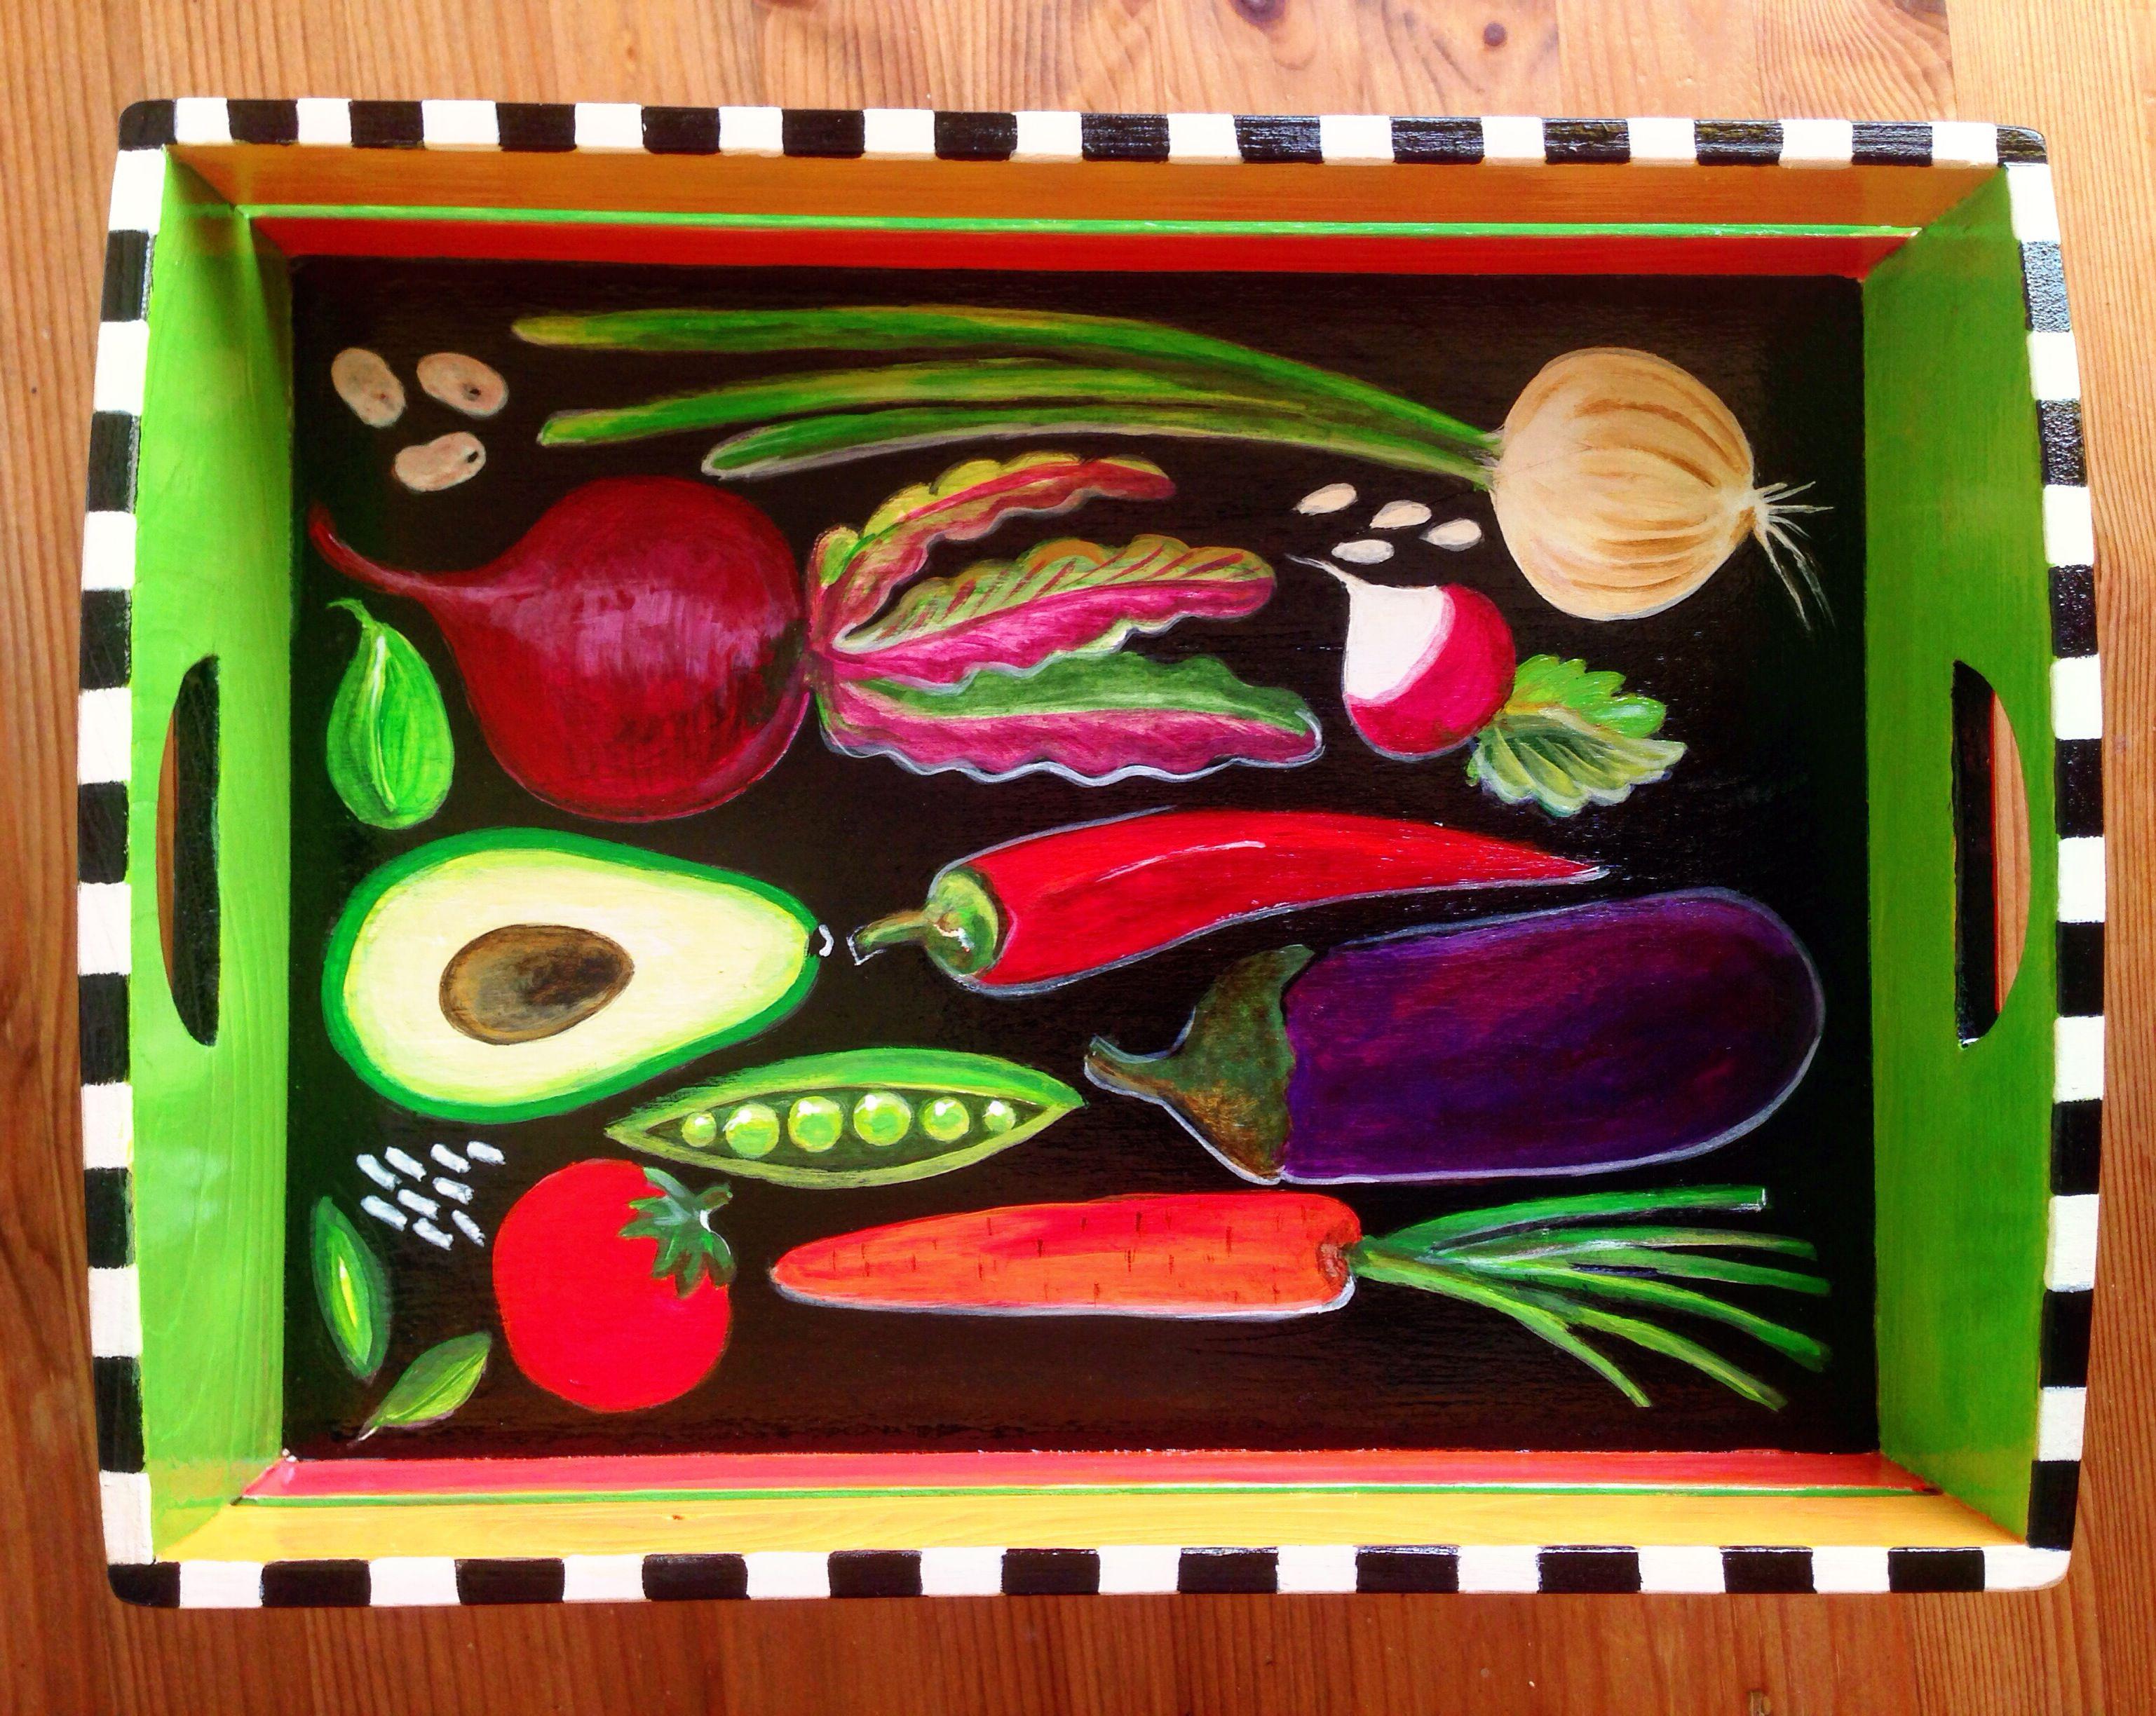 ручнаяработа кухоннаяутварь кухня поднос подарки